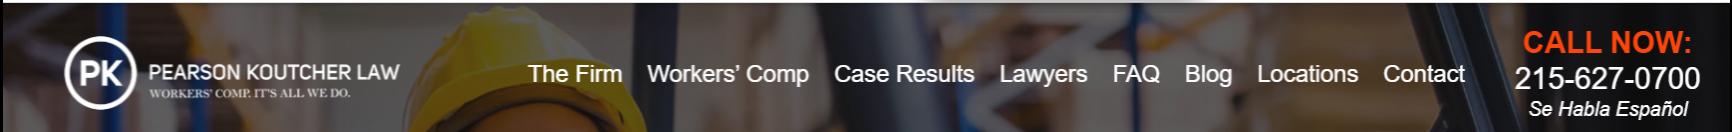 Best Compensation Attorneys in Philadelphia